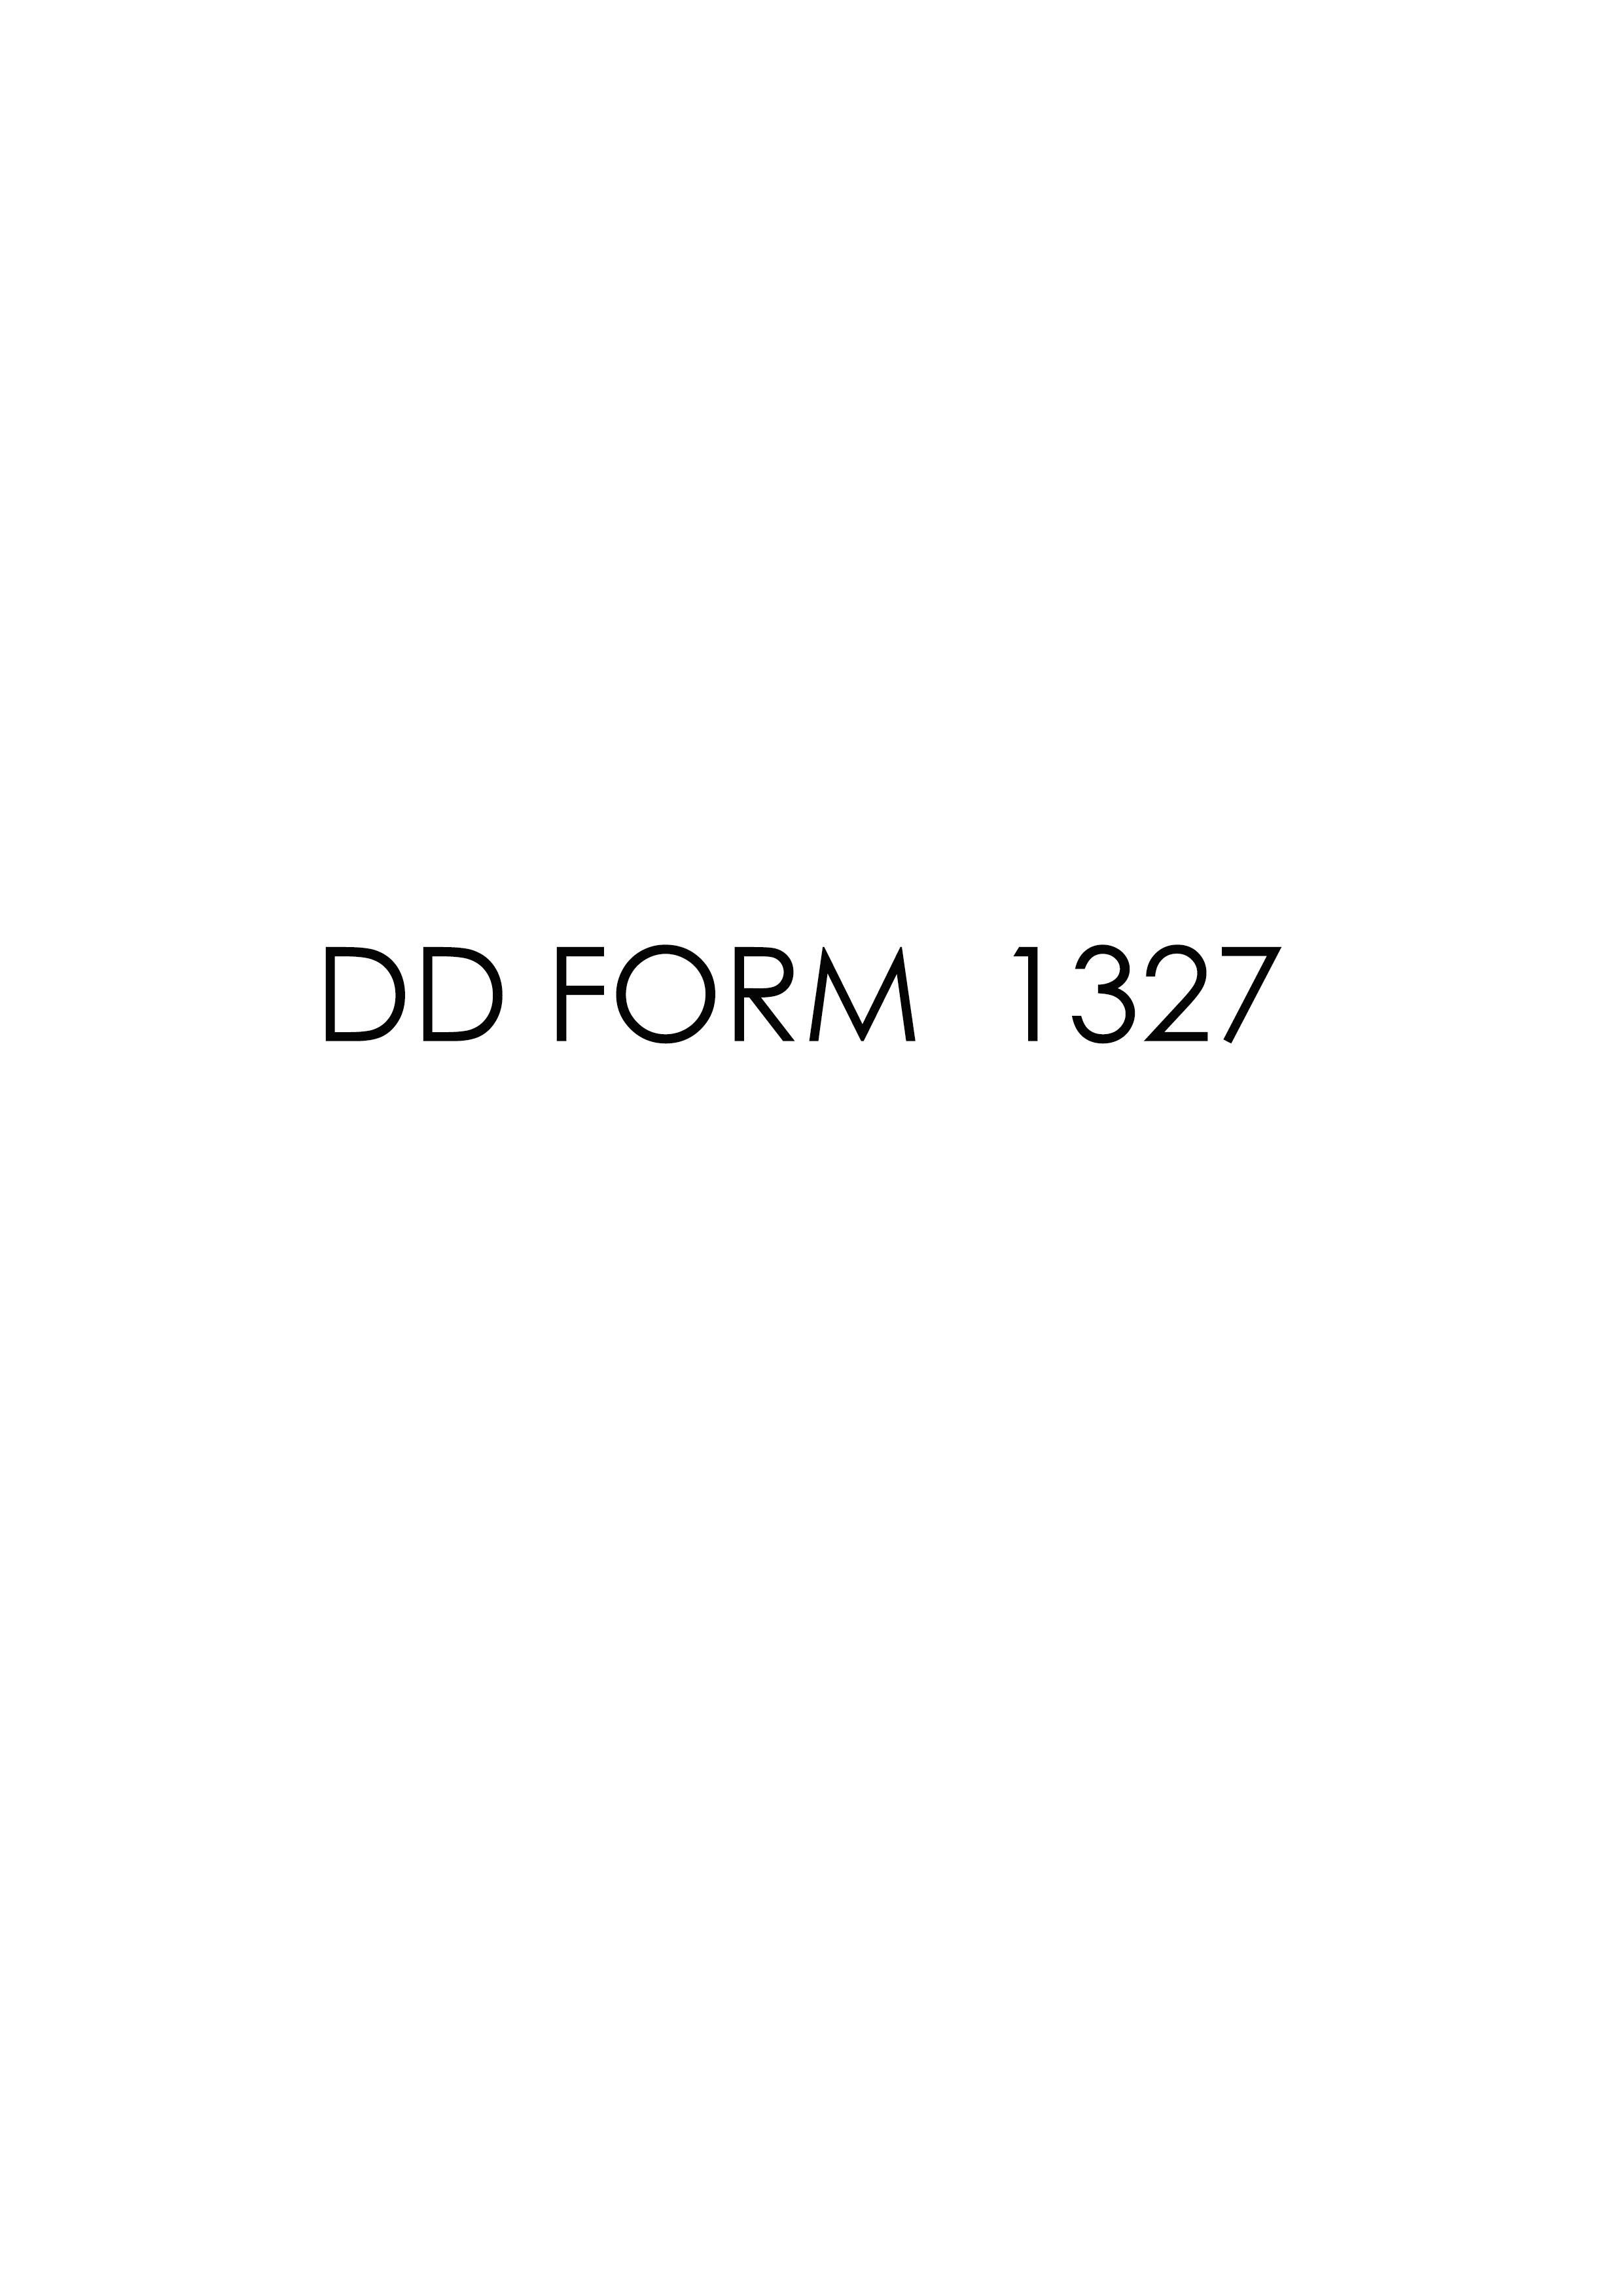 Download dd Form 1327 Free